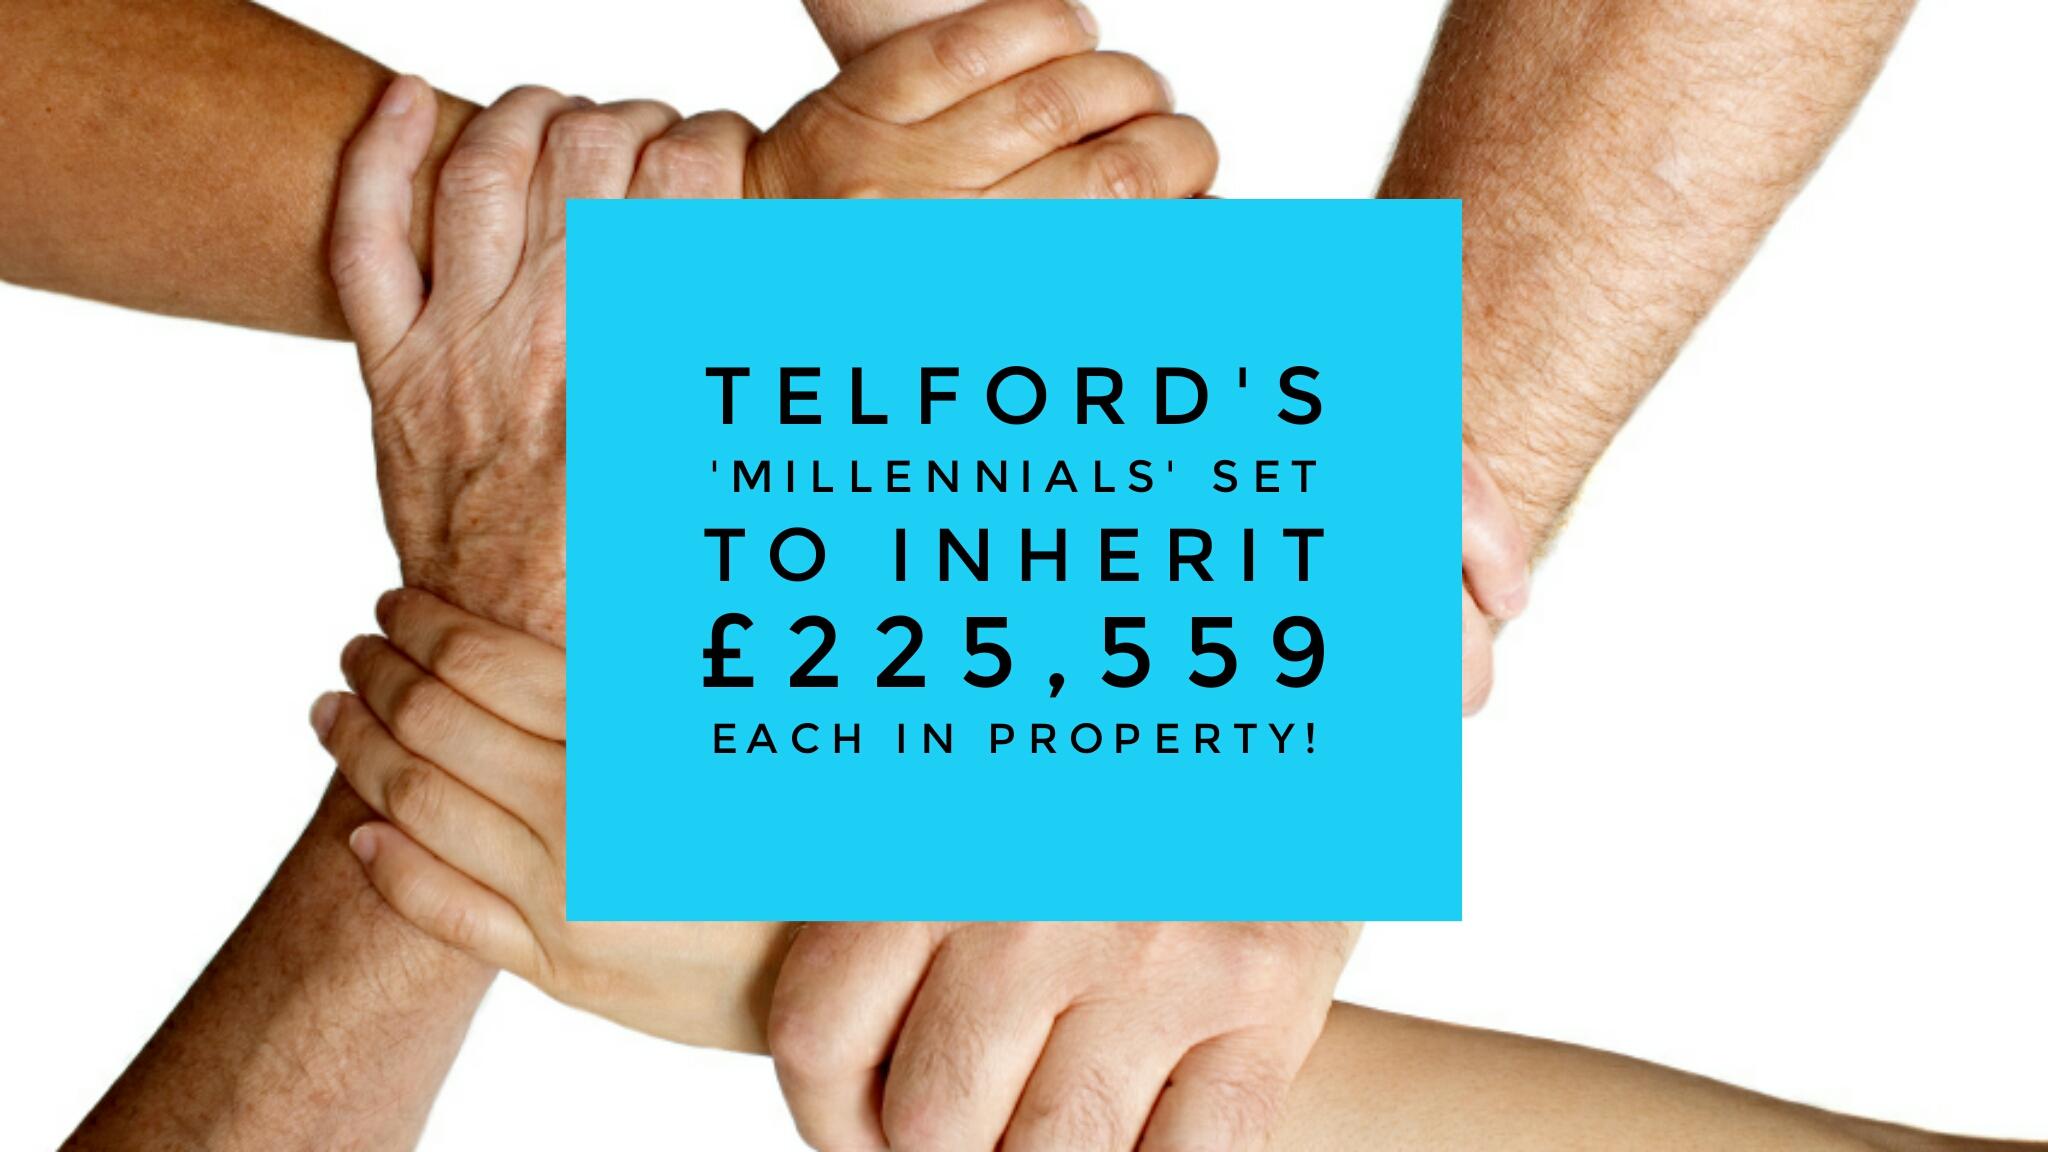 Telford's 'Millennials' set to inherit £225,559 each in property!